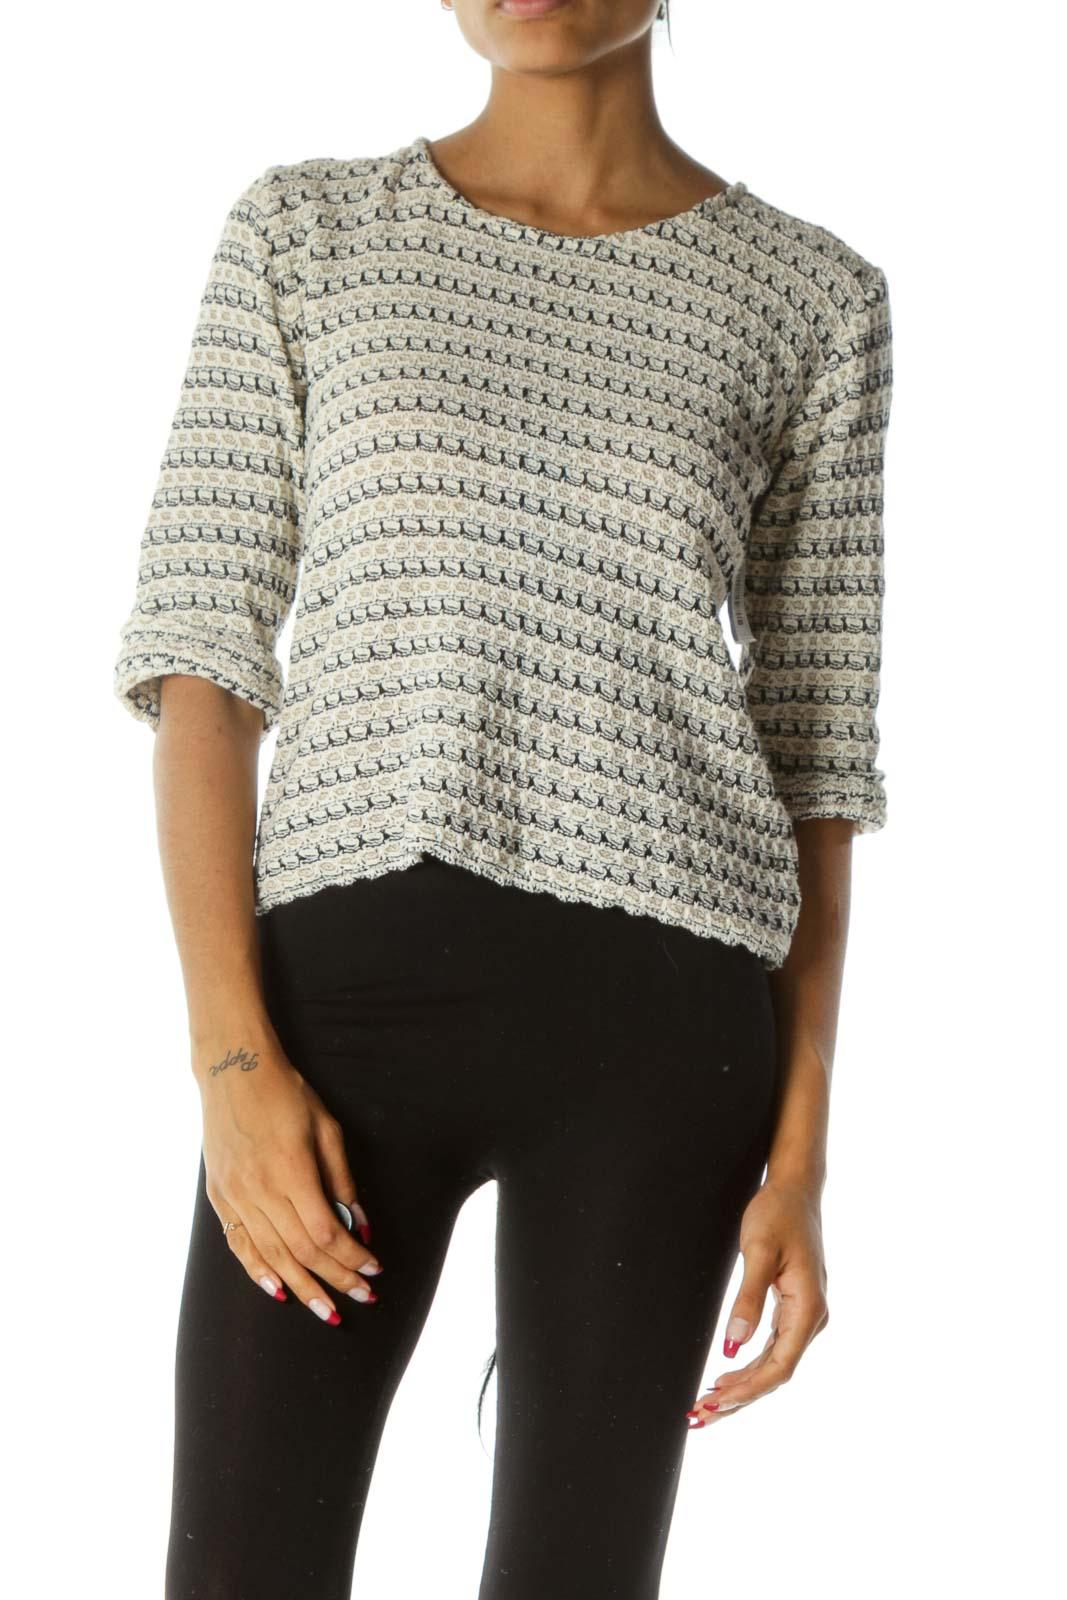 Black White Beige Knit Pattern 3/4 Sleeve Stretch Top